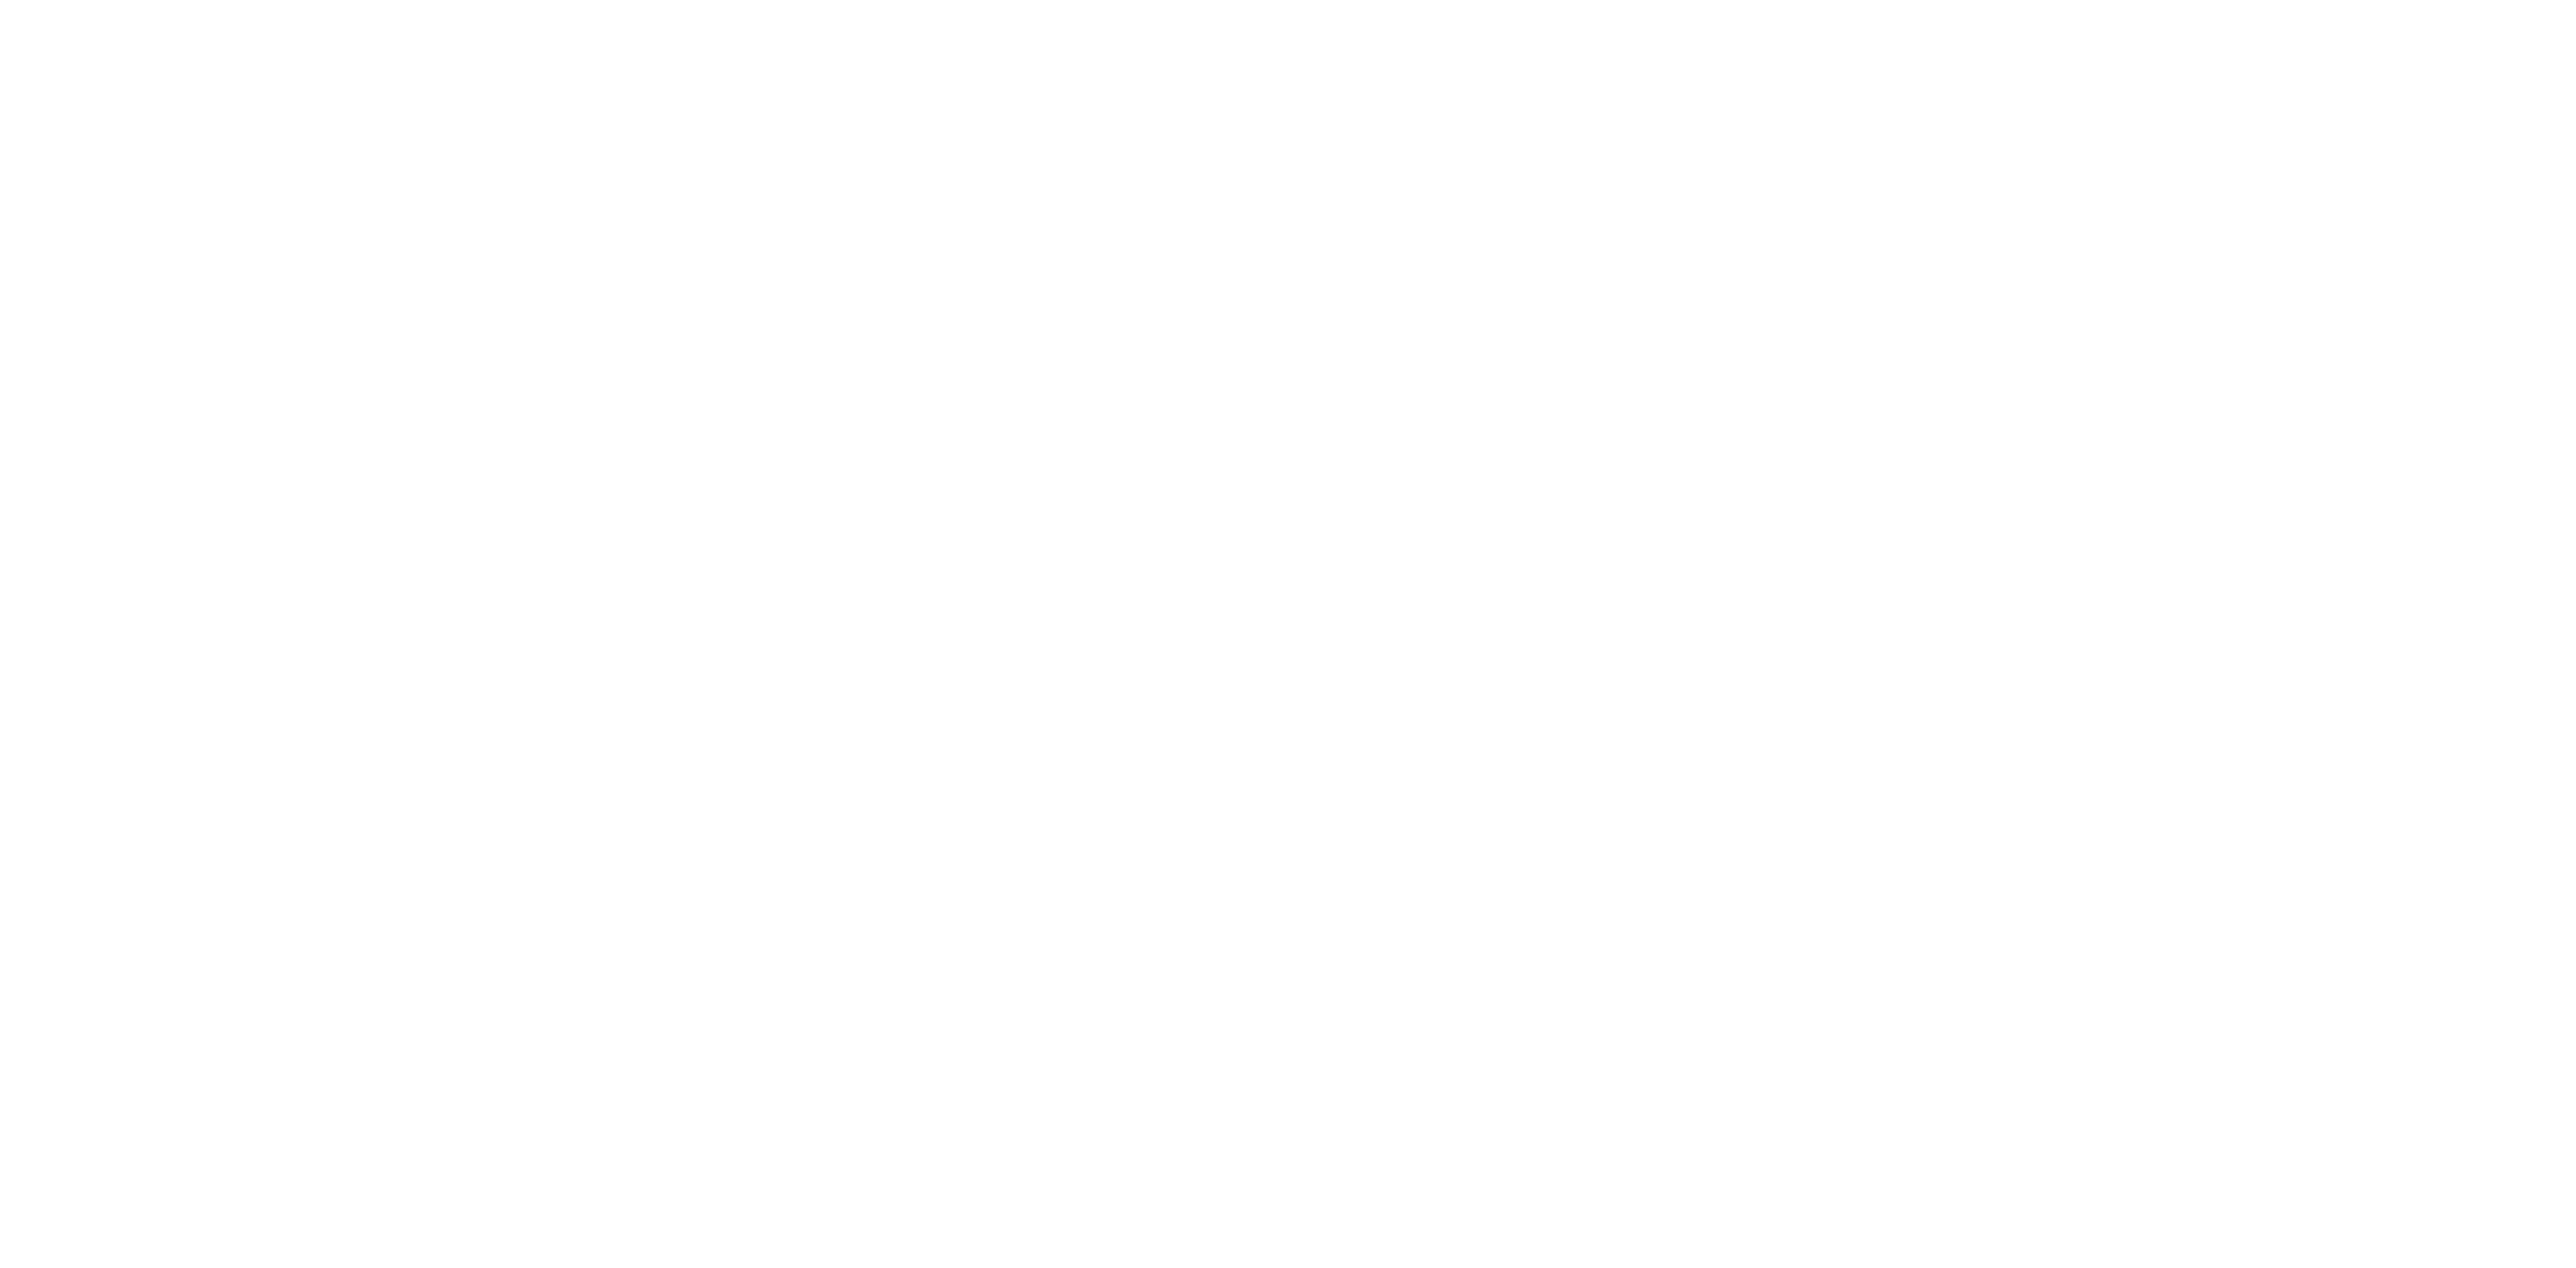 DjDavidAaron.com - Living the Dream